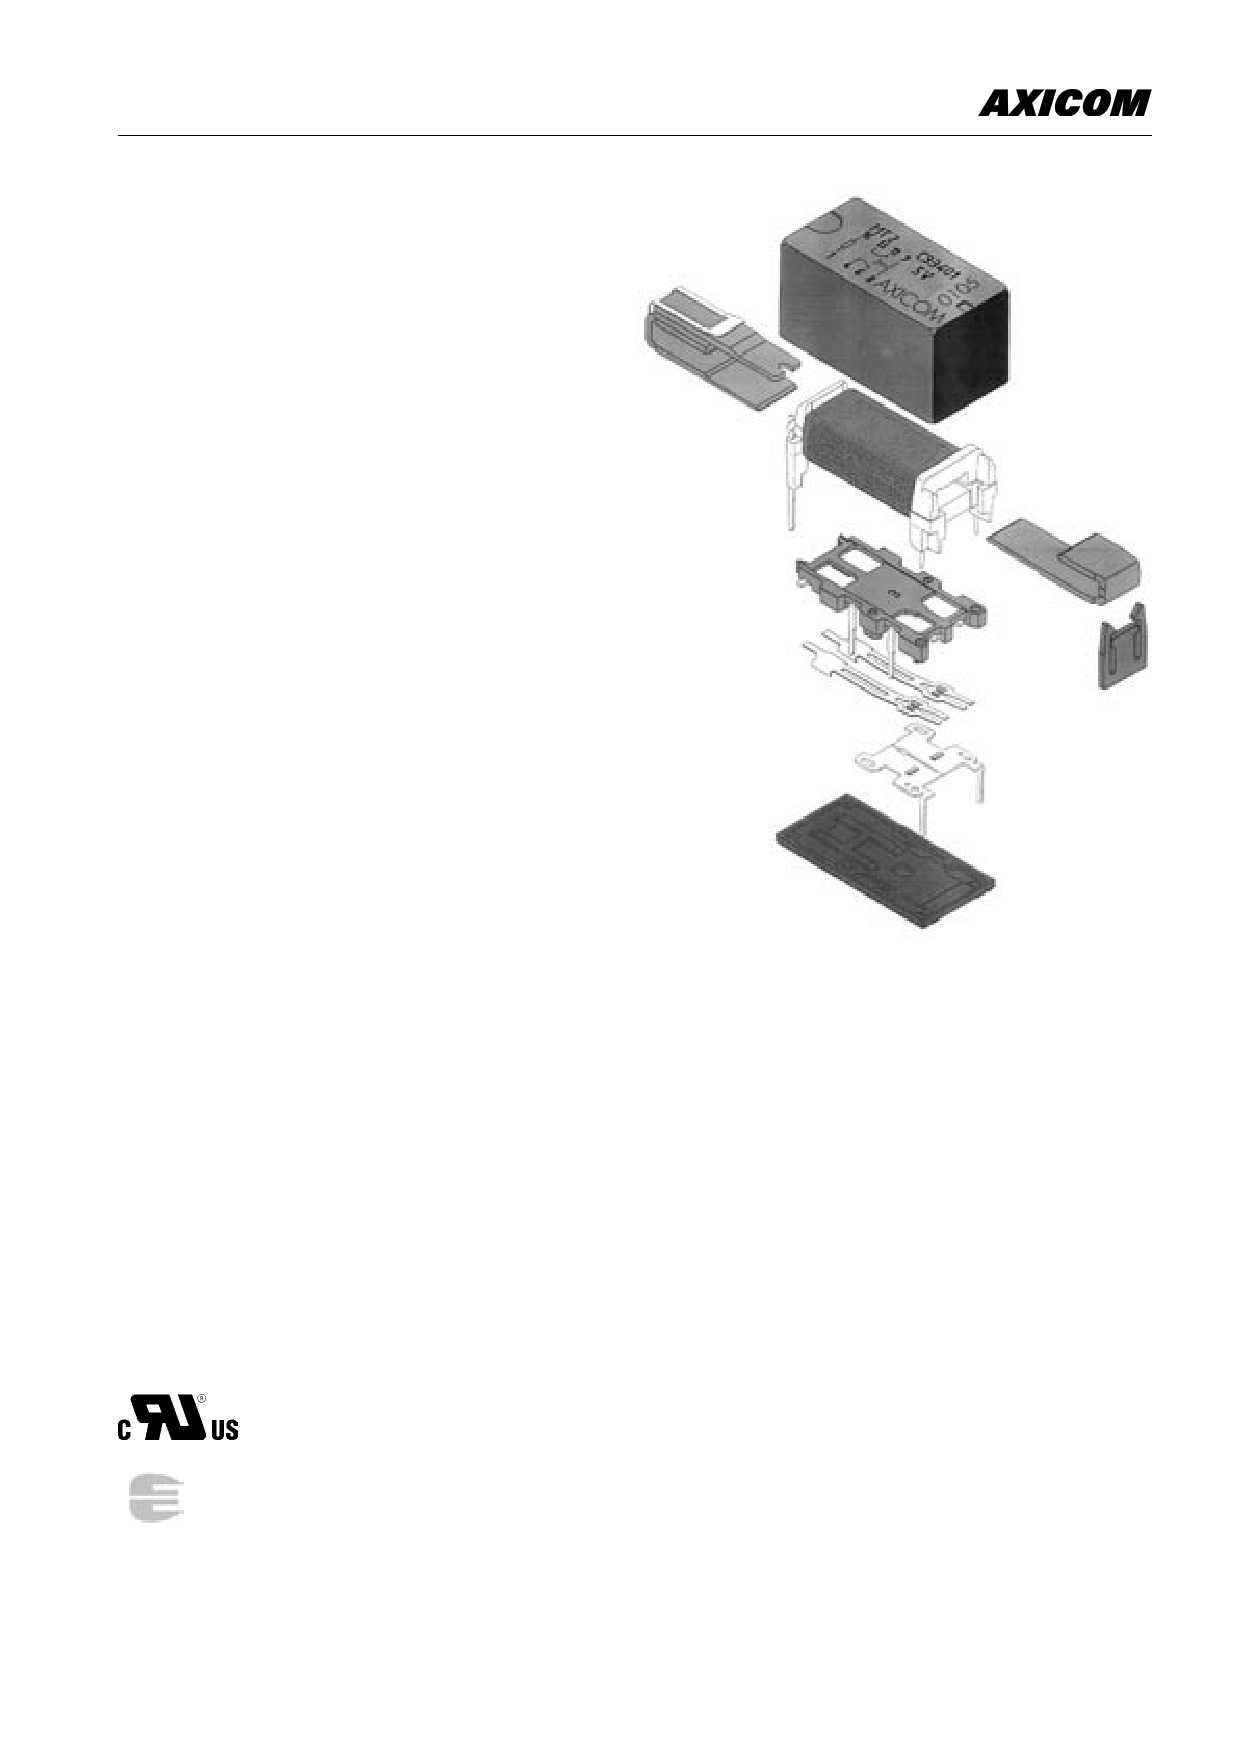 6-1462000-1 Даташит, Описание, Даташиты